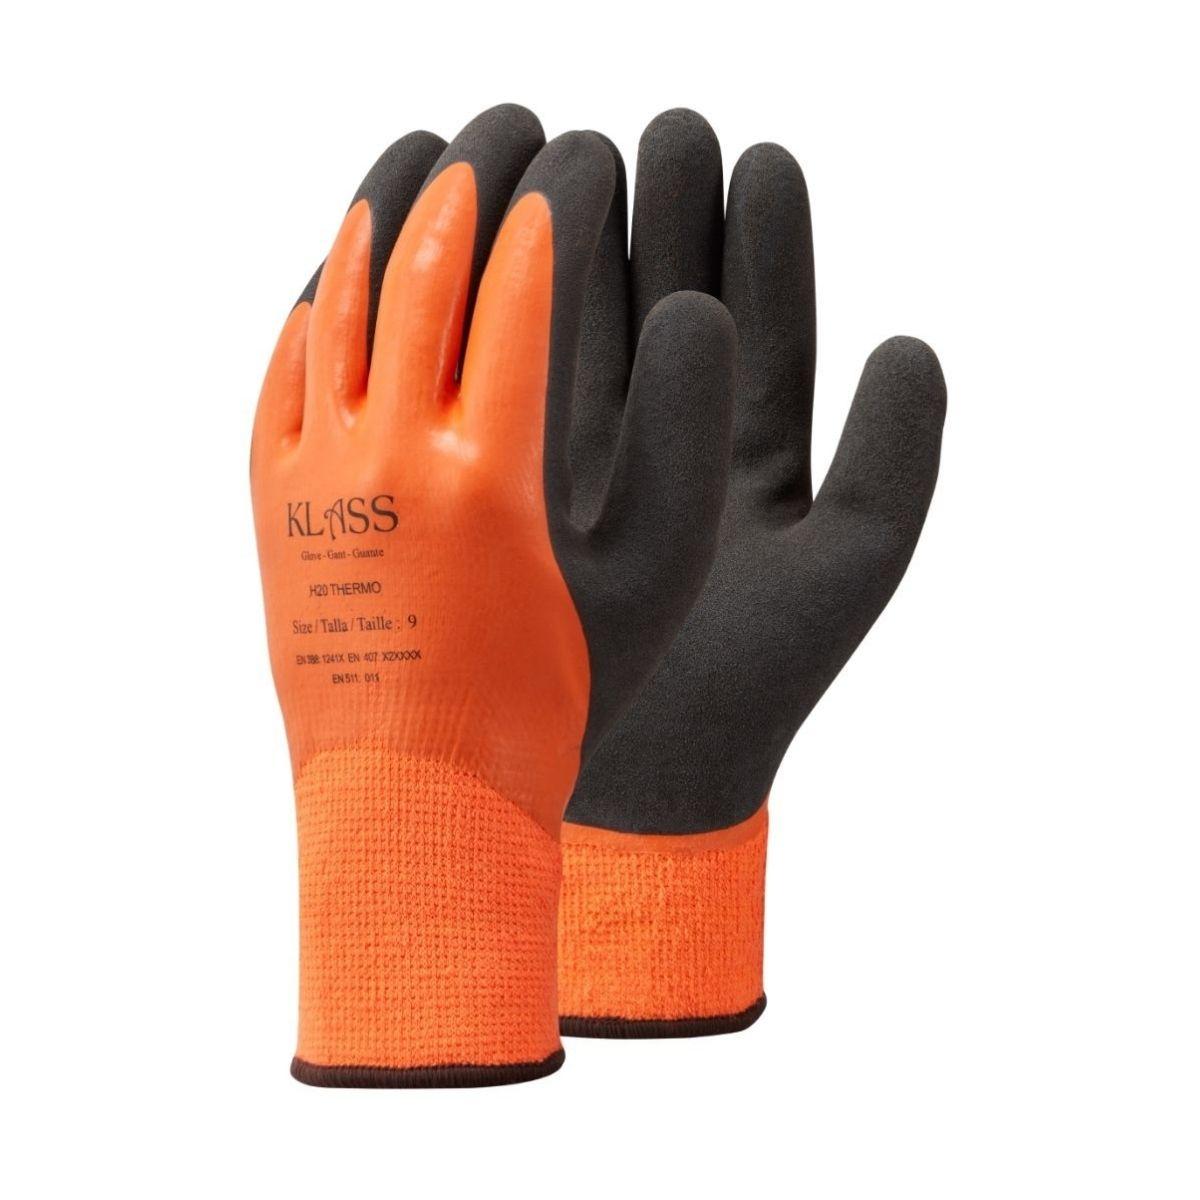 GL1535 Thermo Plus Waterproof Glove